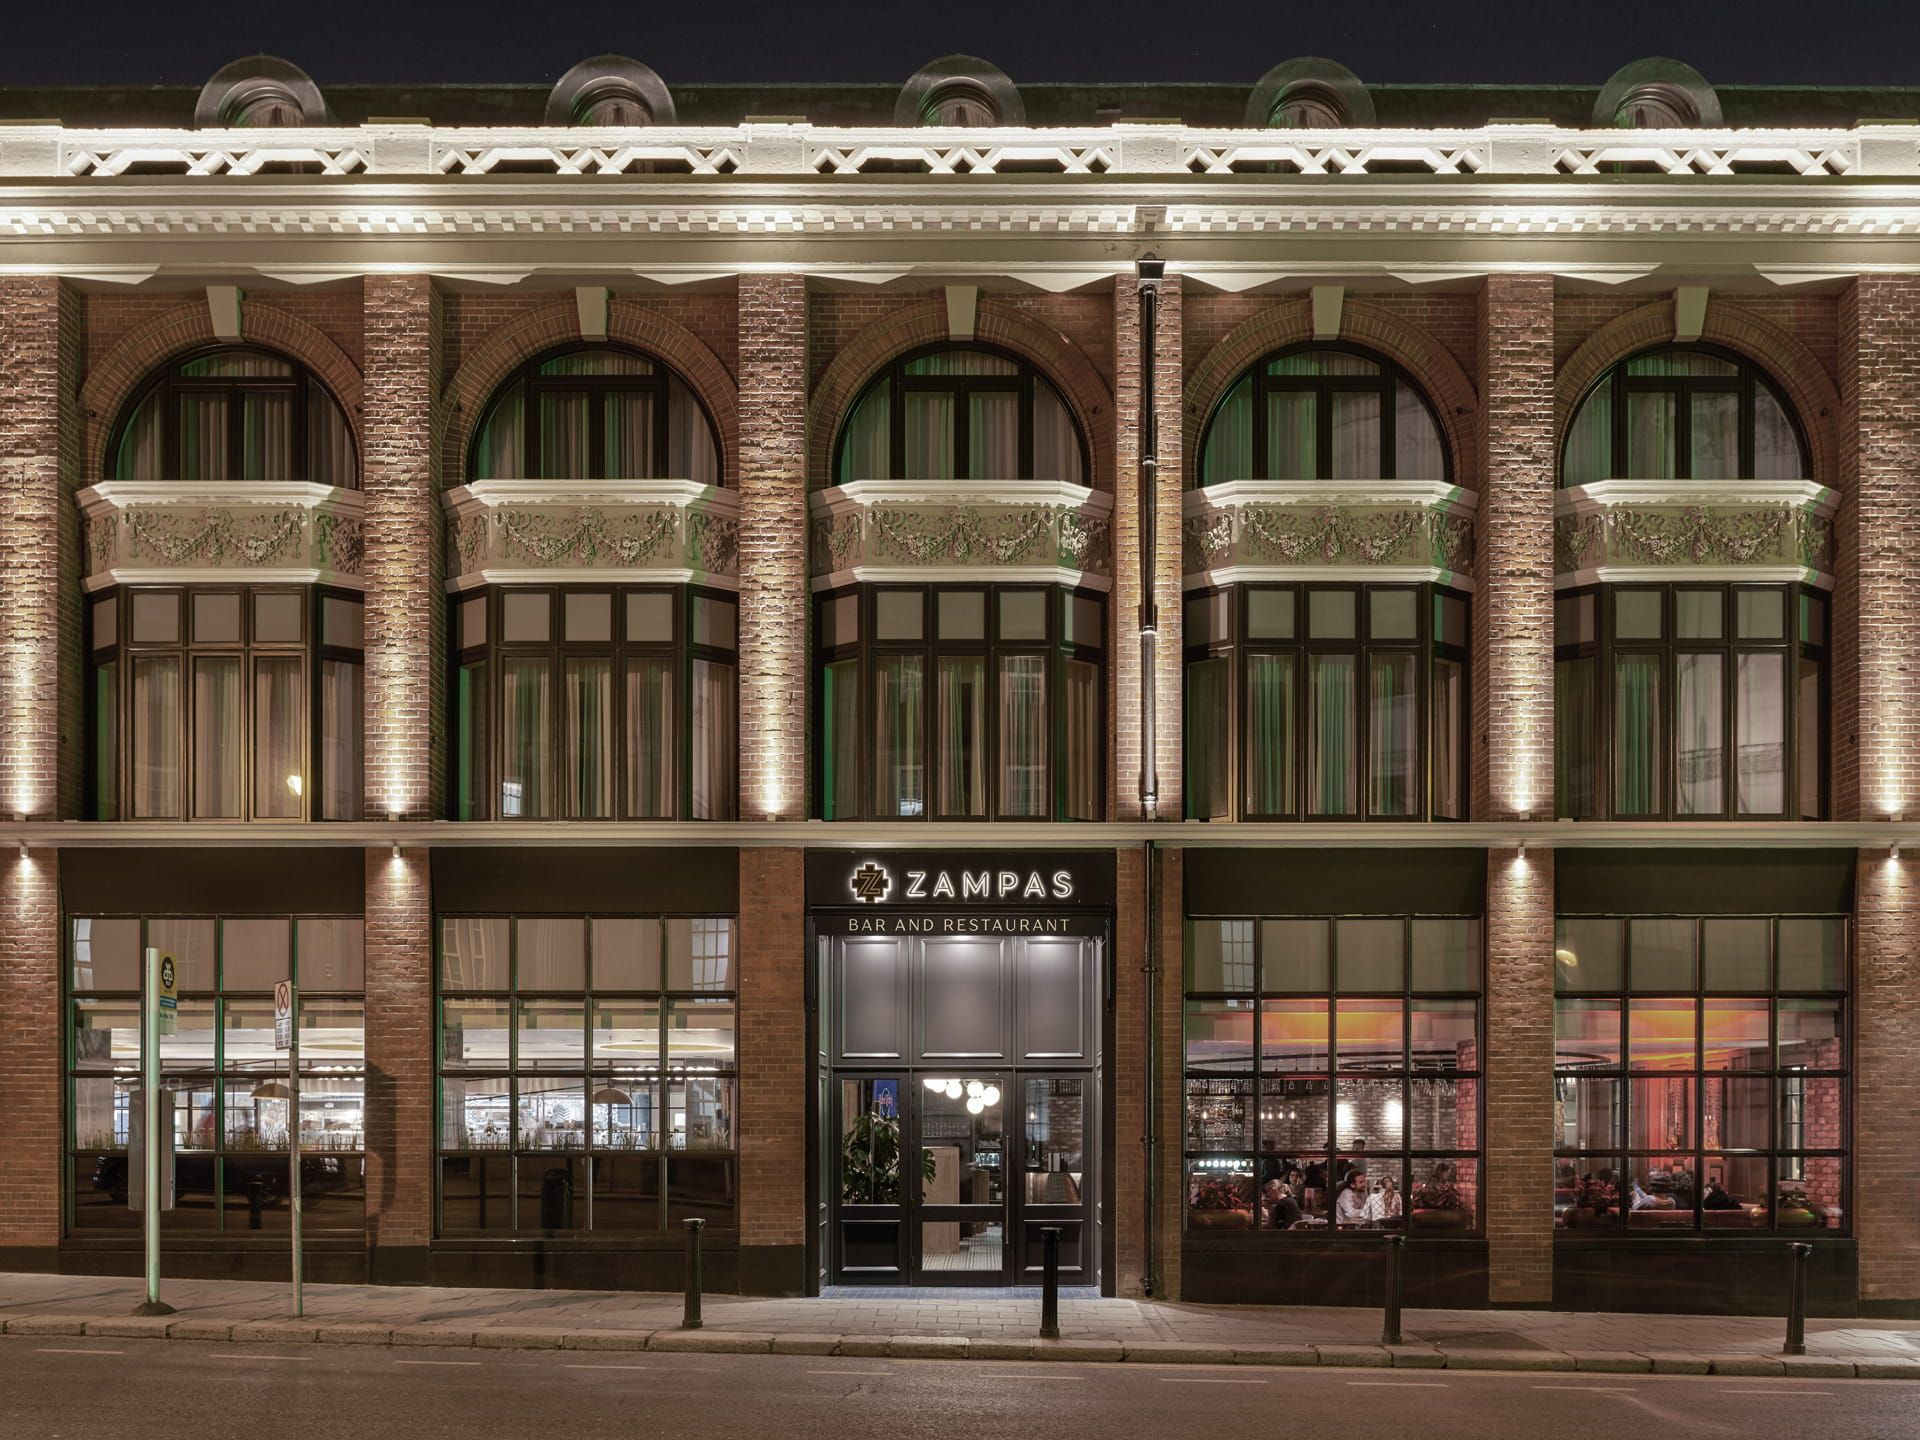 Zampas Restaurant Building